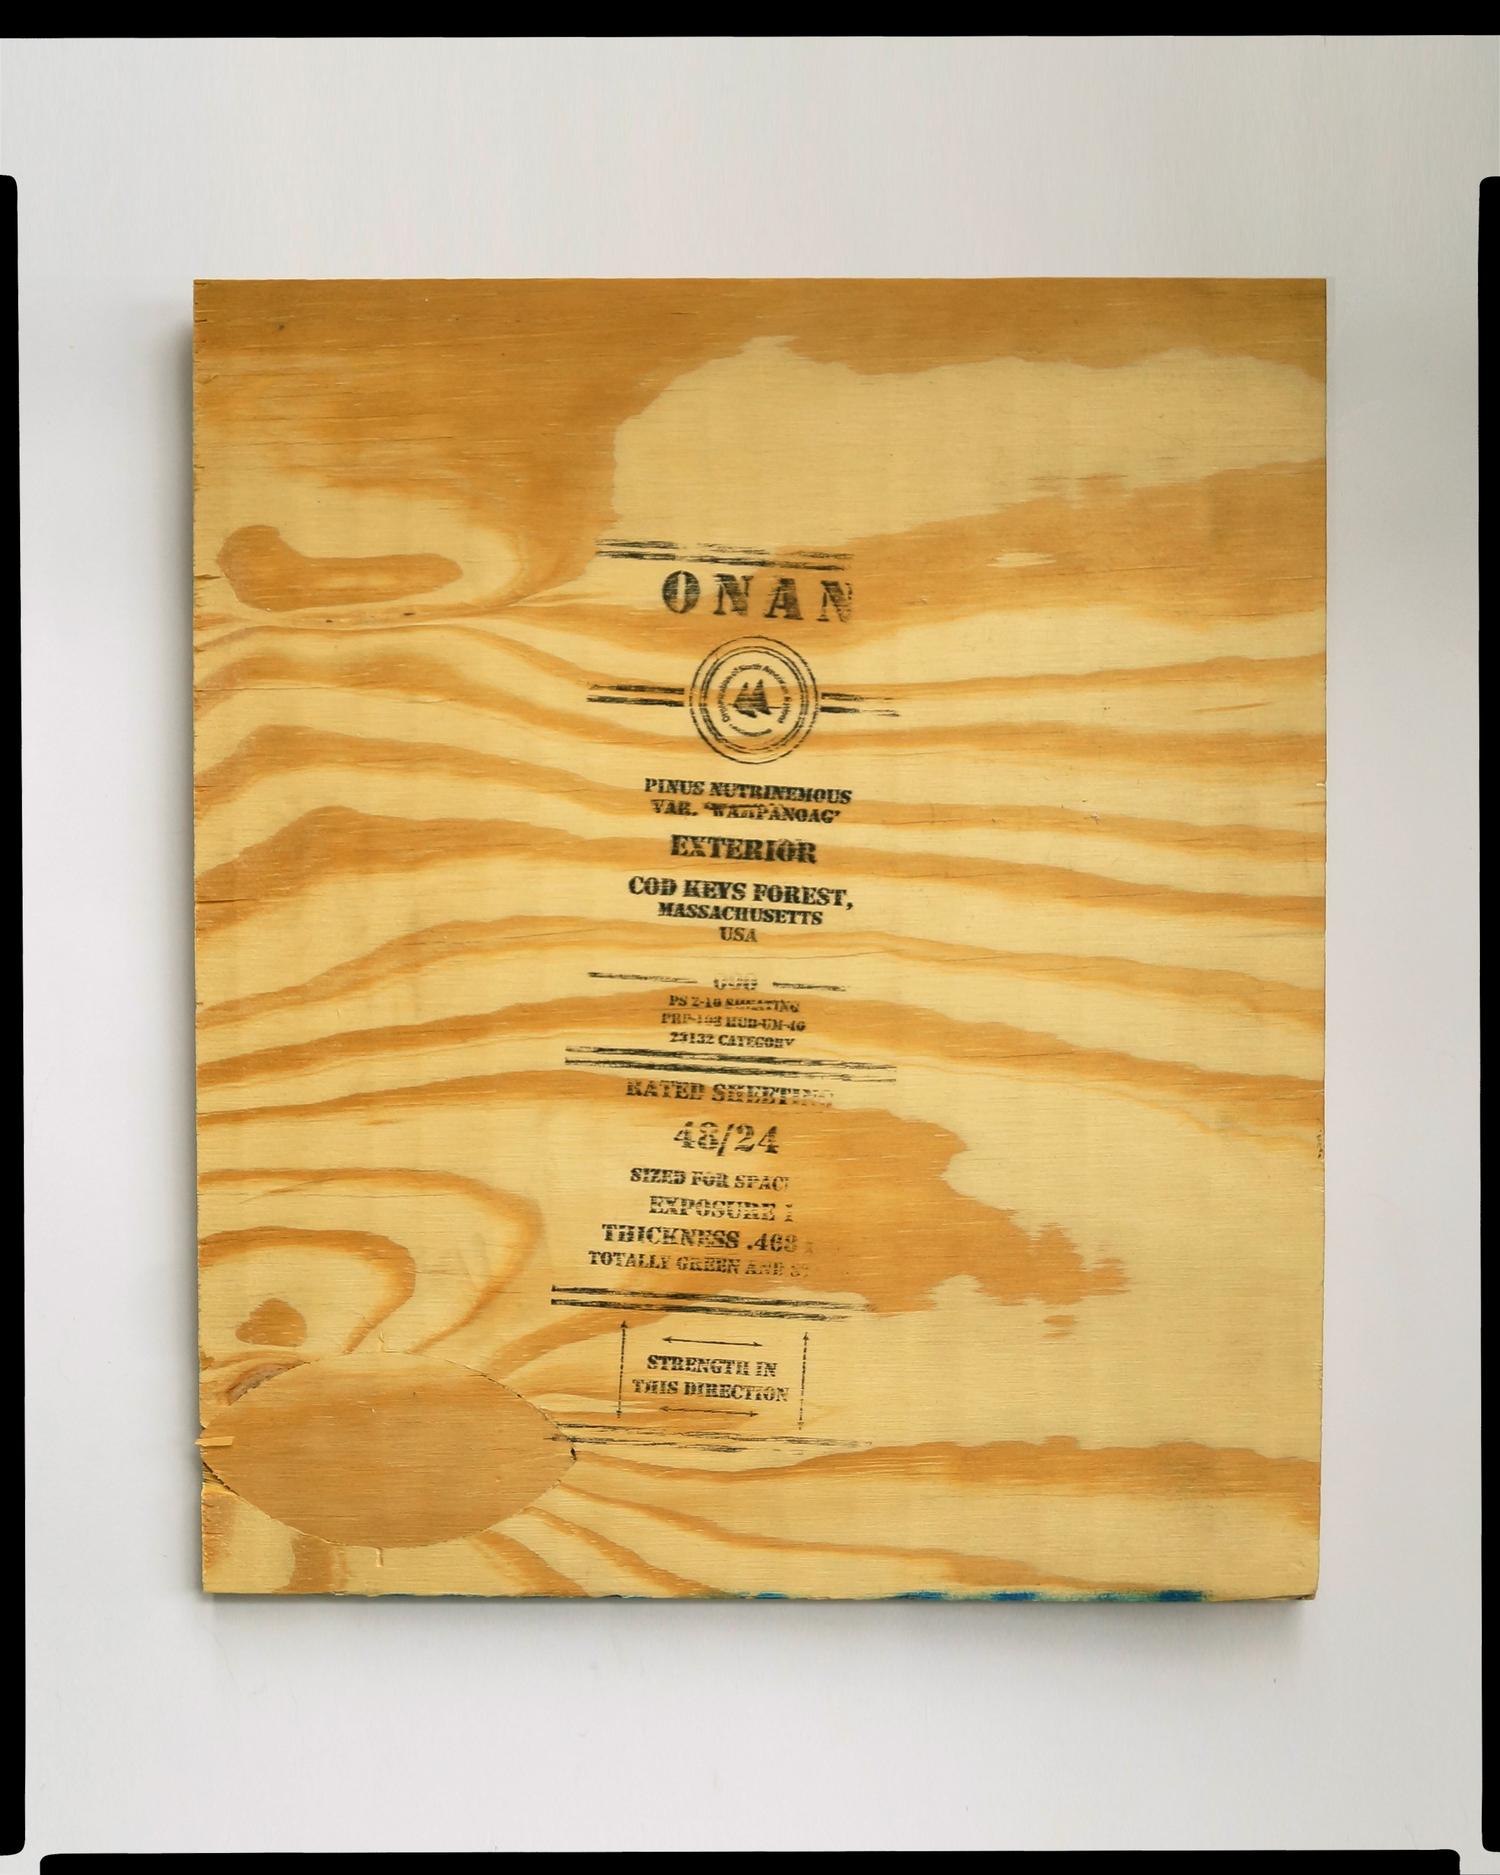 """ Sand Authority Rated Sheeting  ®."" Pinus nutrinemous var. ""Wampanoag"" green-harvested from Cod Keys Forest, Massachusetts; ONAN-SA, 2142."